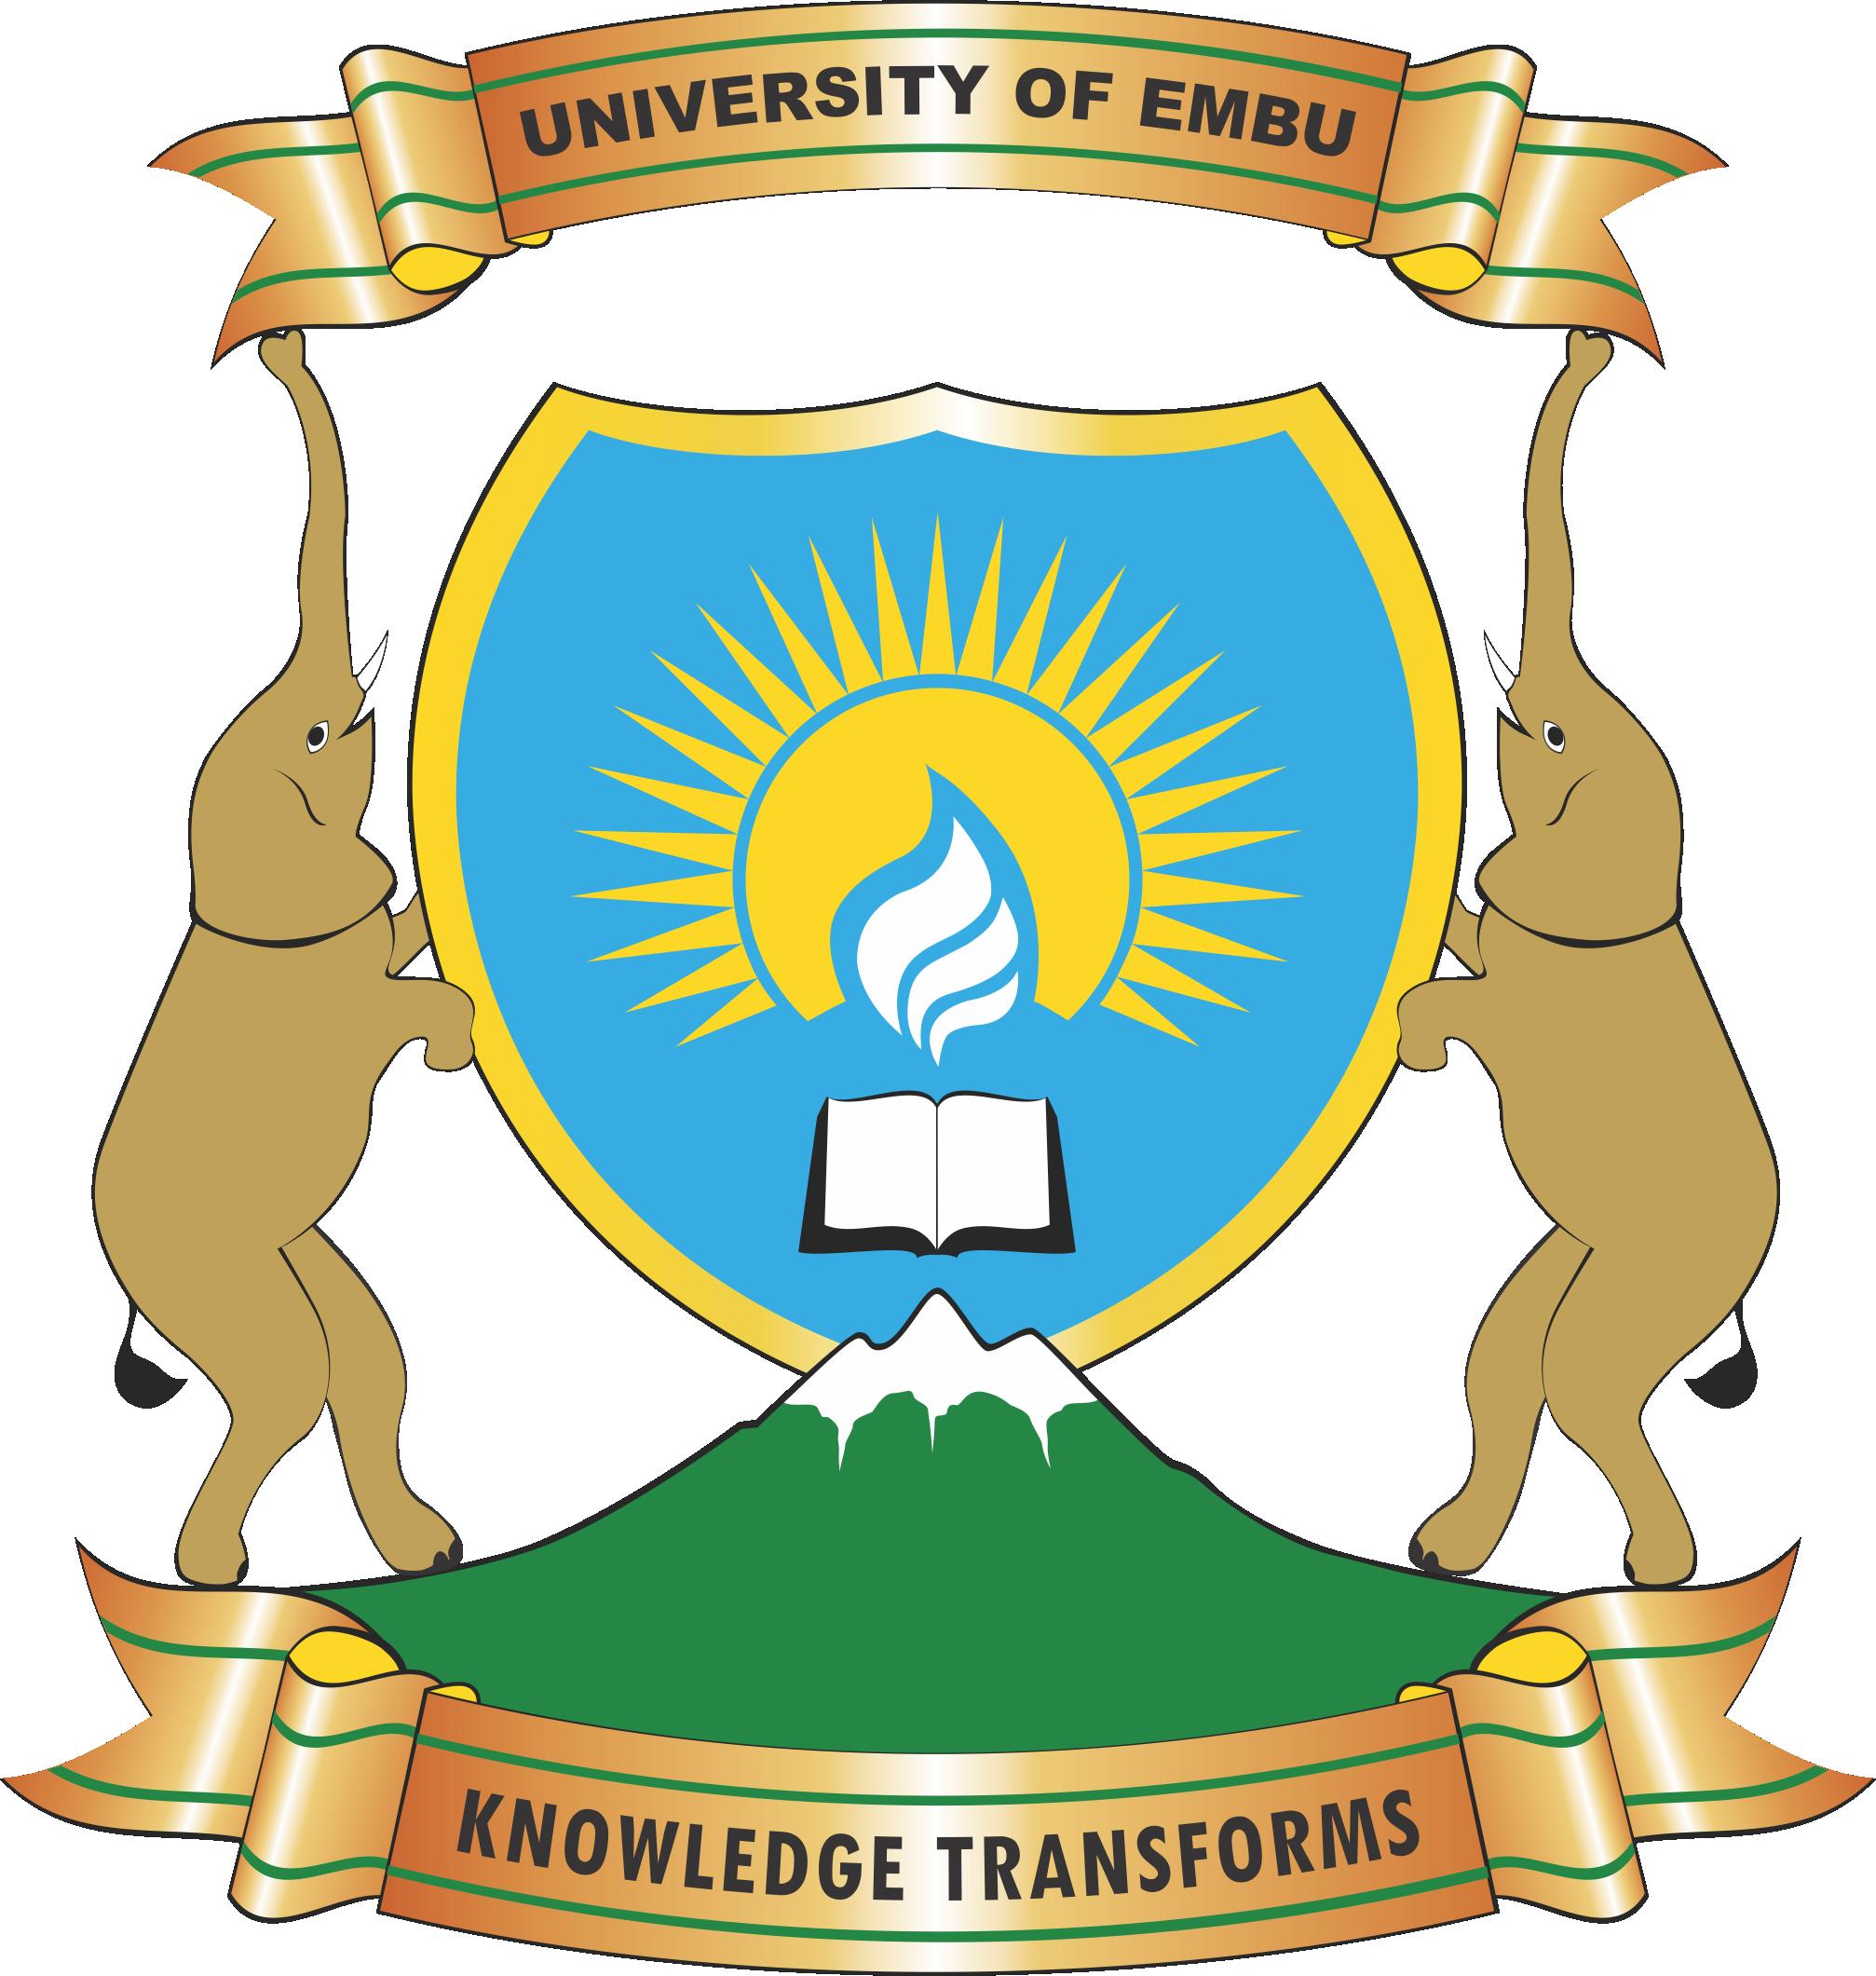 University-of-Embu-logo-6